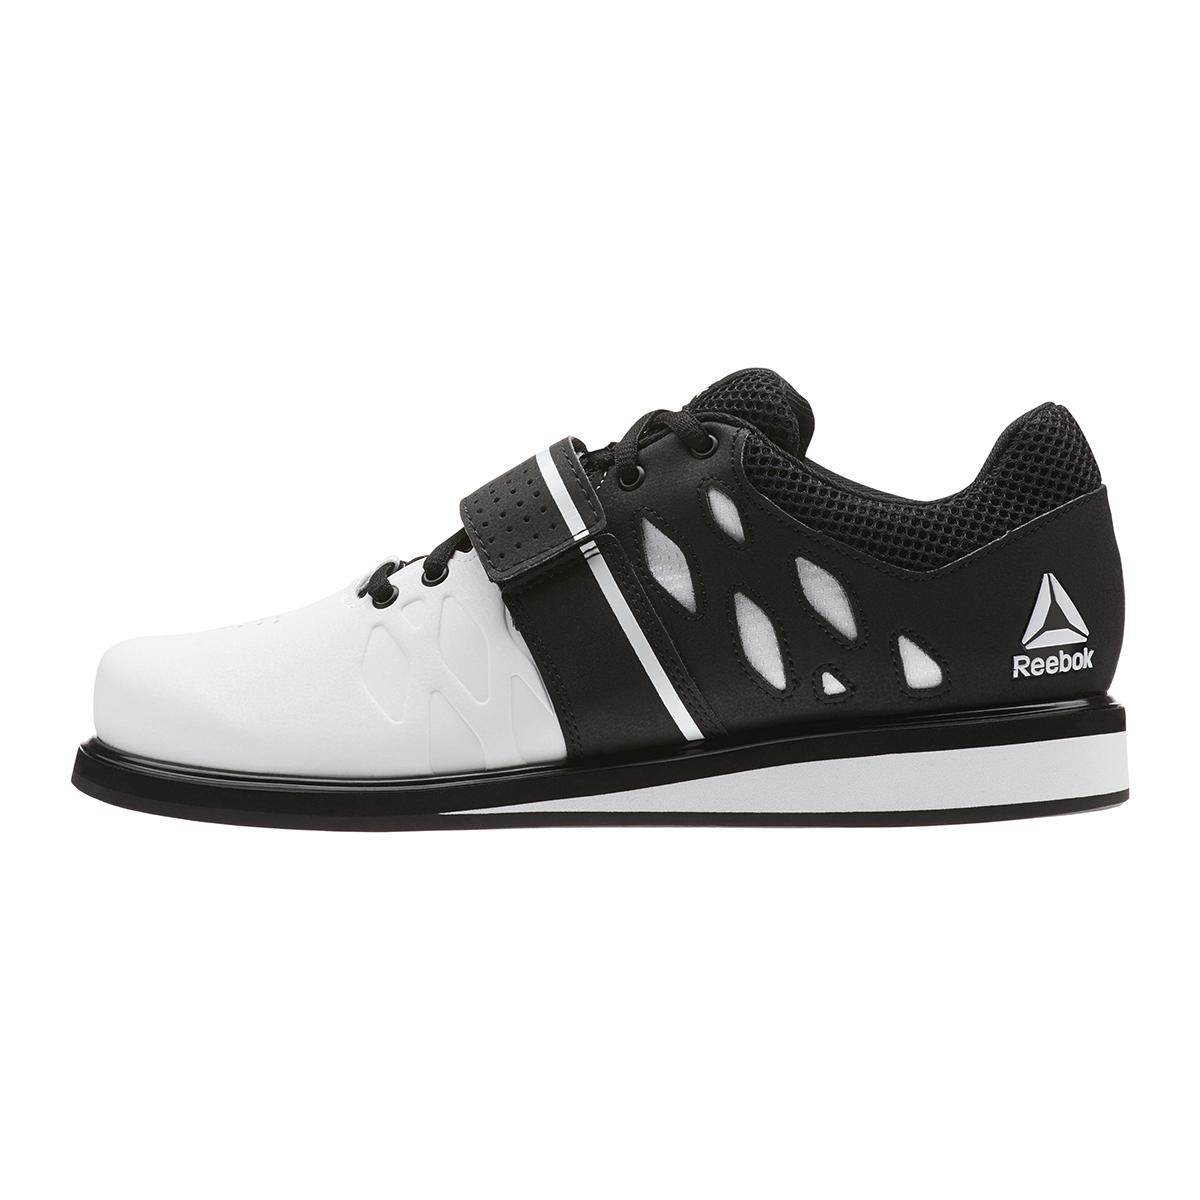 Reebok Lifter PR Training Shoes - Color: White/Black (Regular Width) - Size: 6.5, White/Black, large, image 2